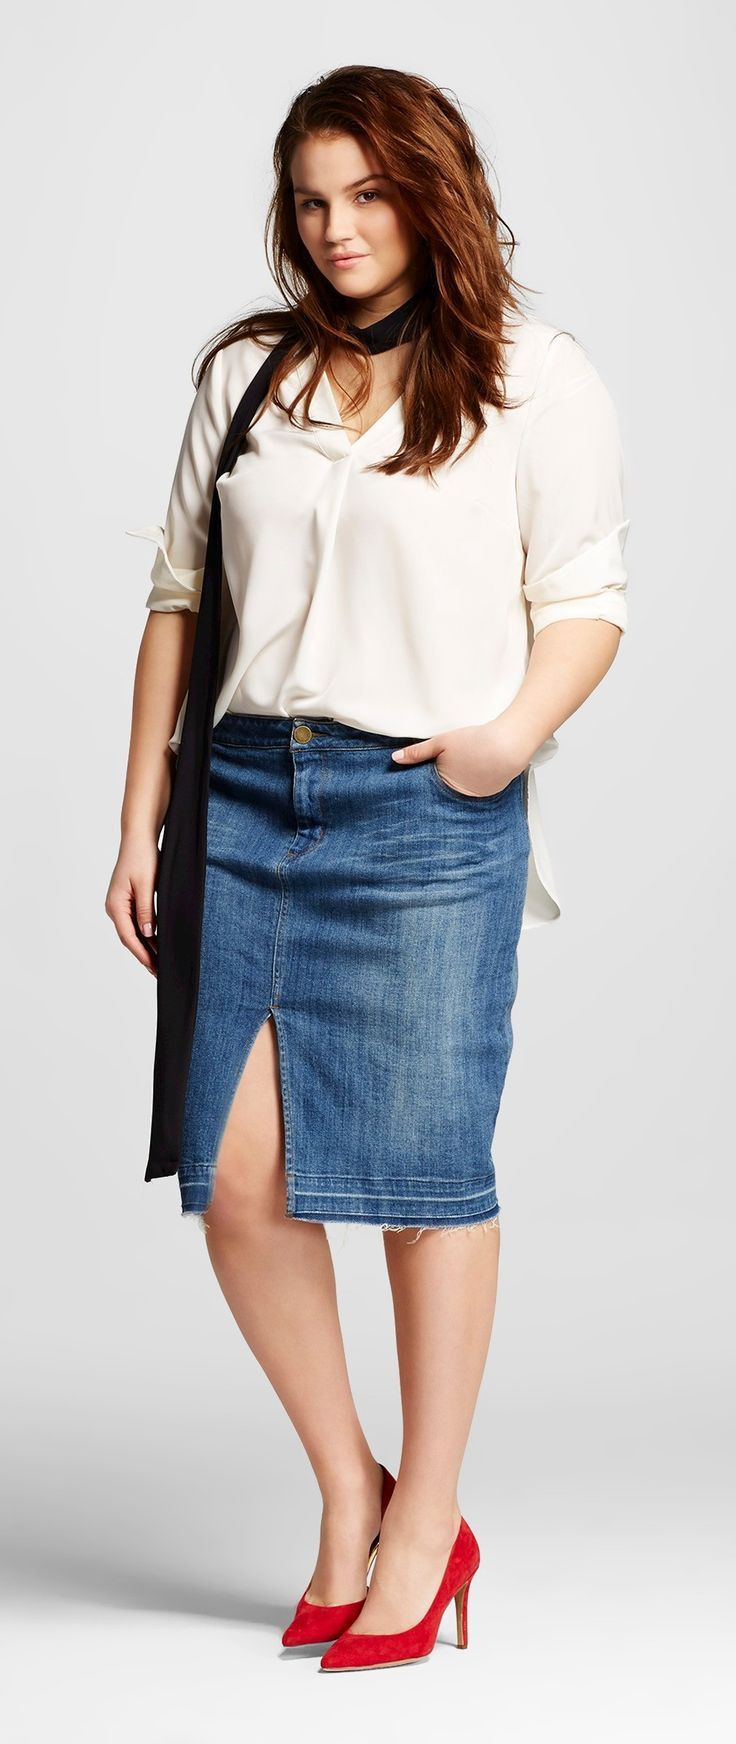 d69e843048 Plus Size Denim Pencil Skirt - Who What Wear at Target | Plus Size ...